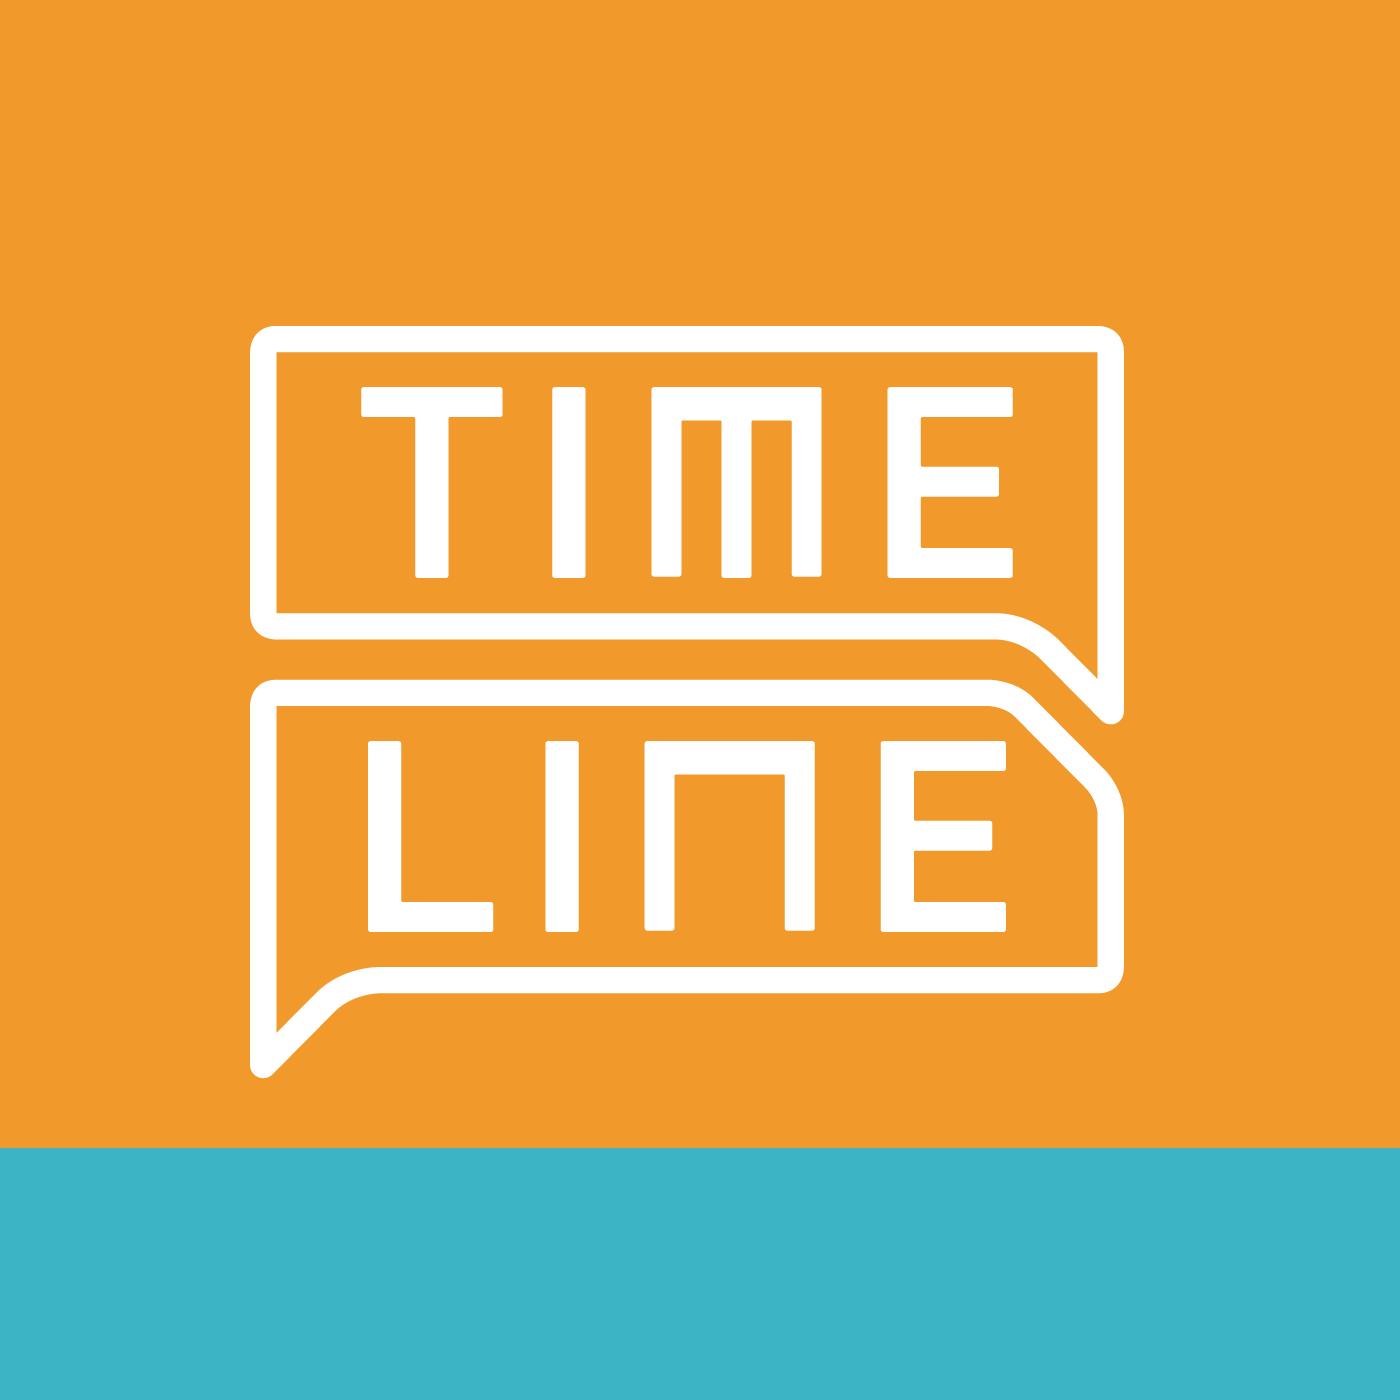 Timeline Gaúcha 23/02/2017